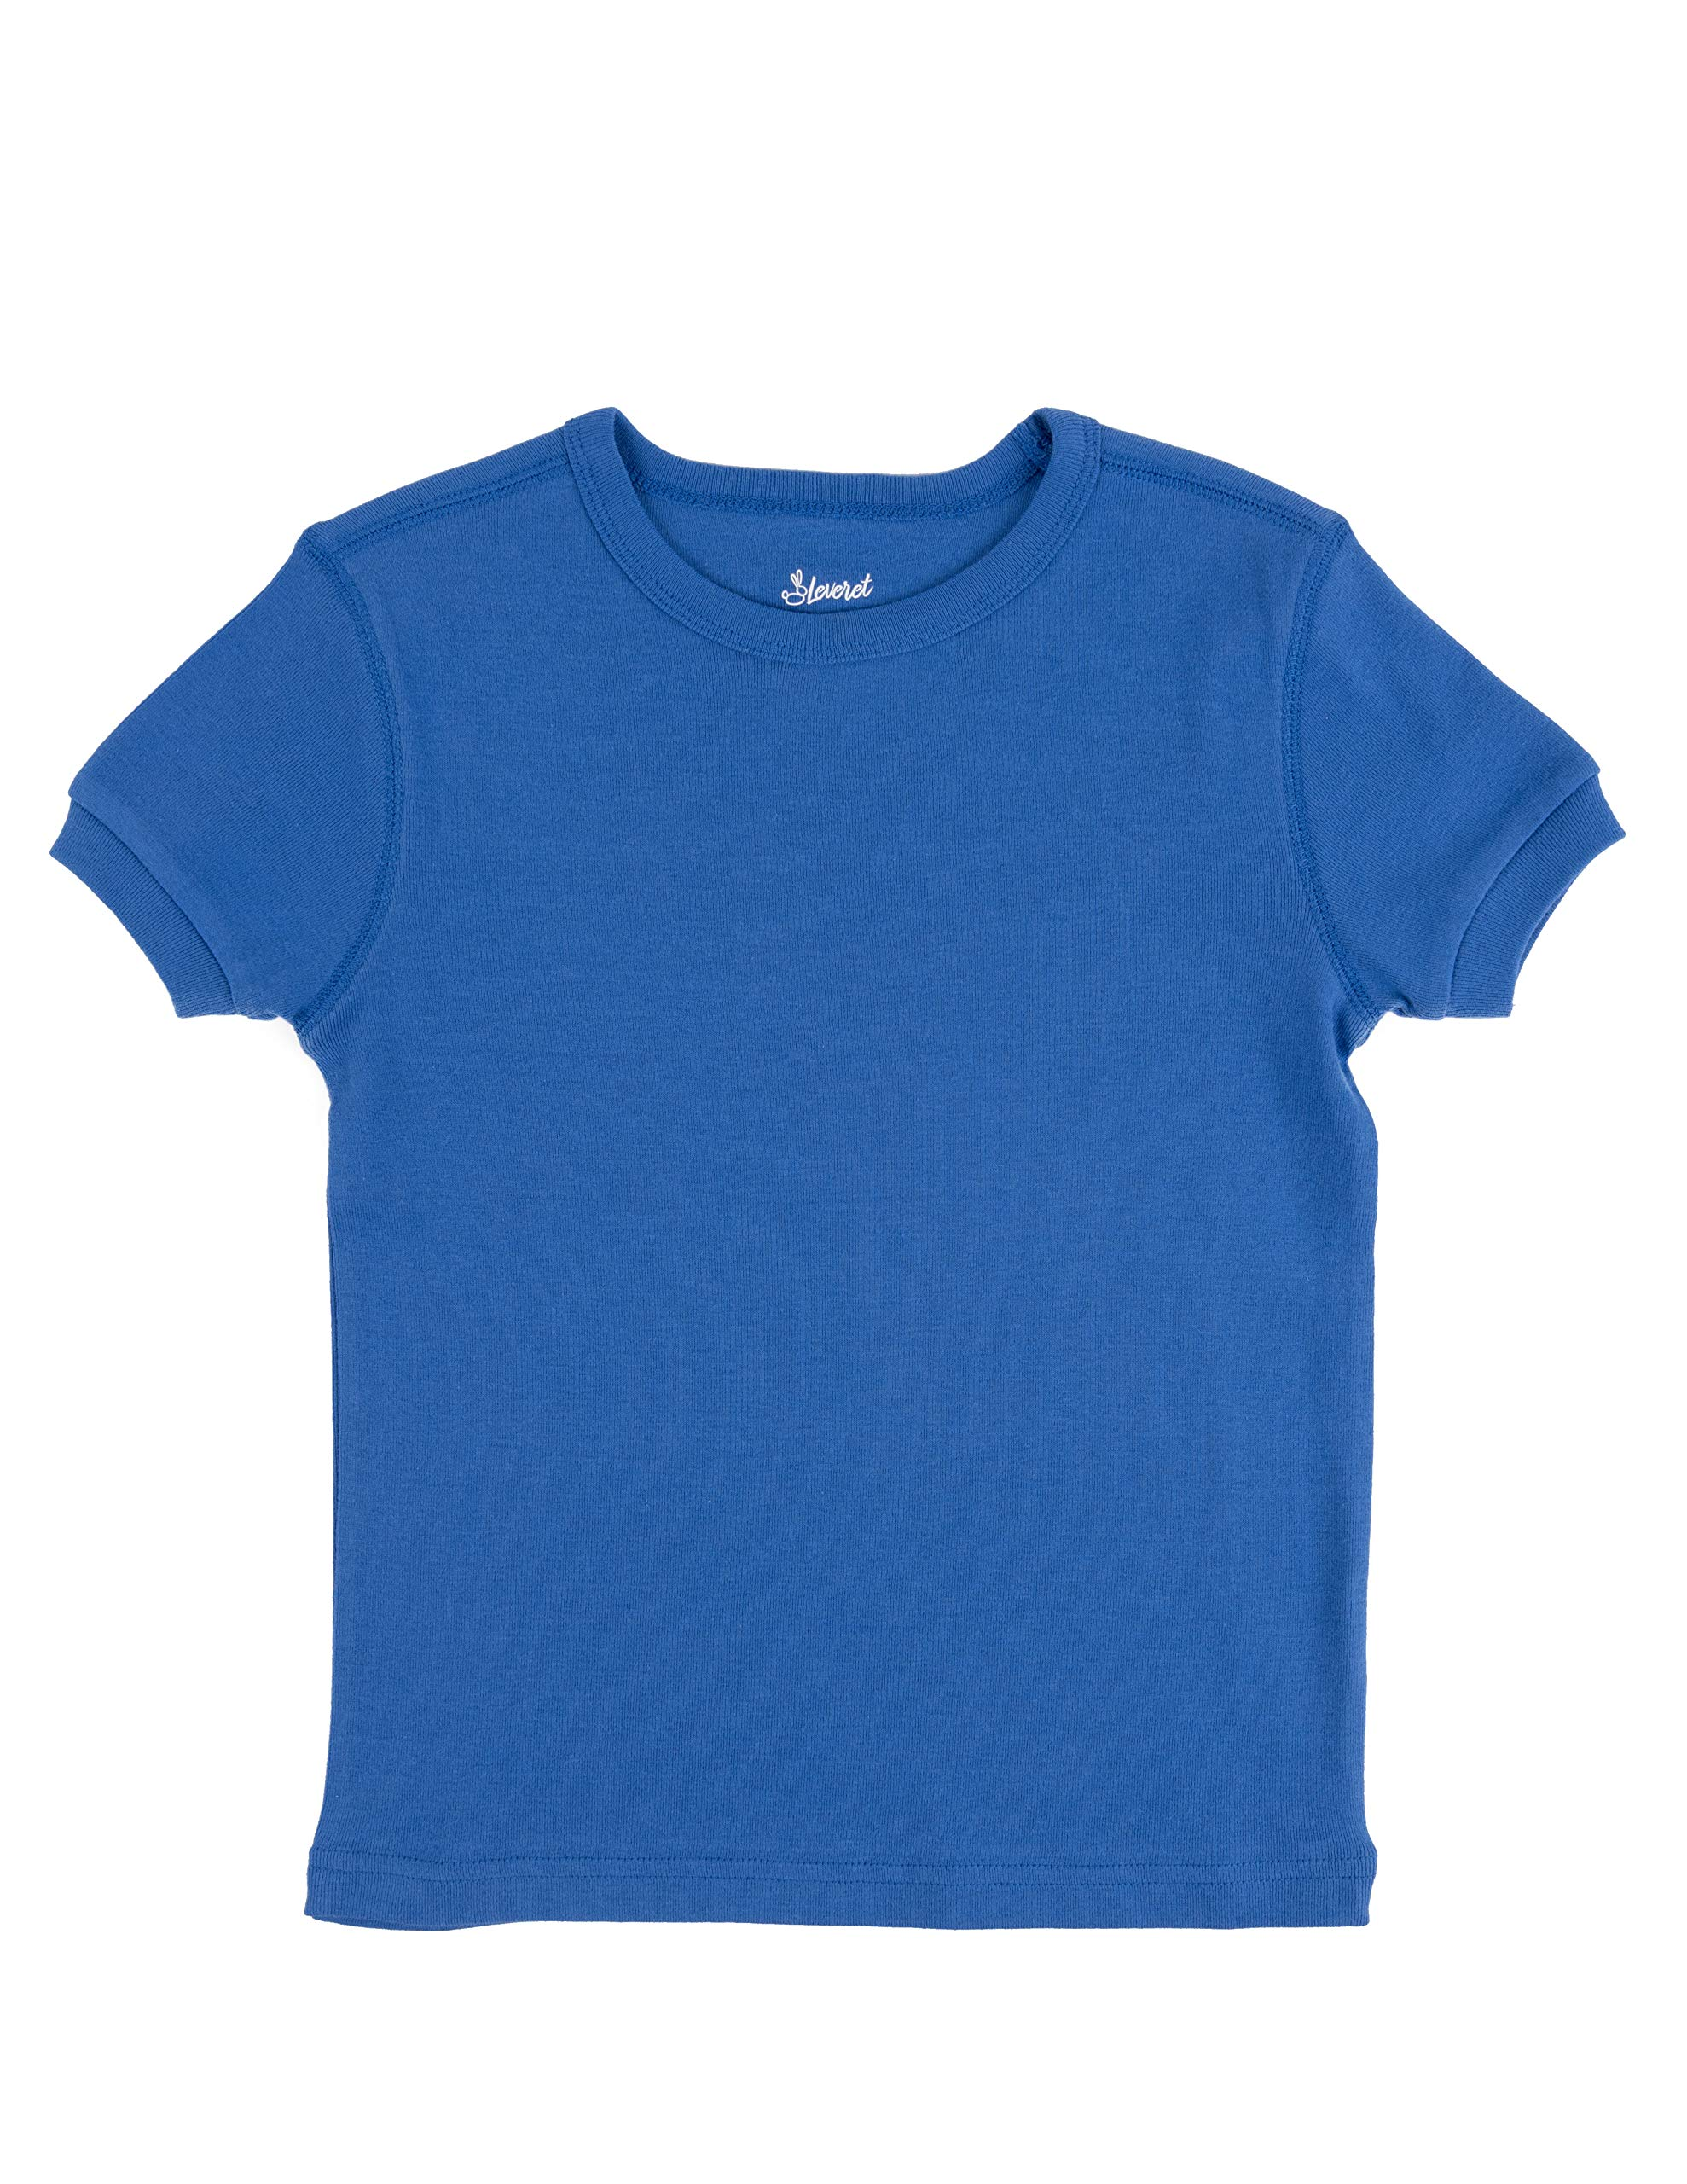 thumbnail 5 - Leveret-Short-Sleeve-Boys-Girls-Kids-amp-Toddler-T-Shirt-100-Cotton-2-14-Years